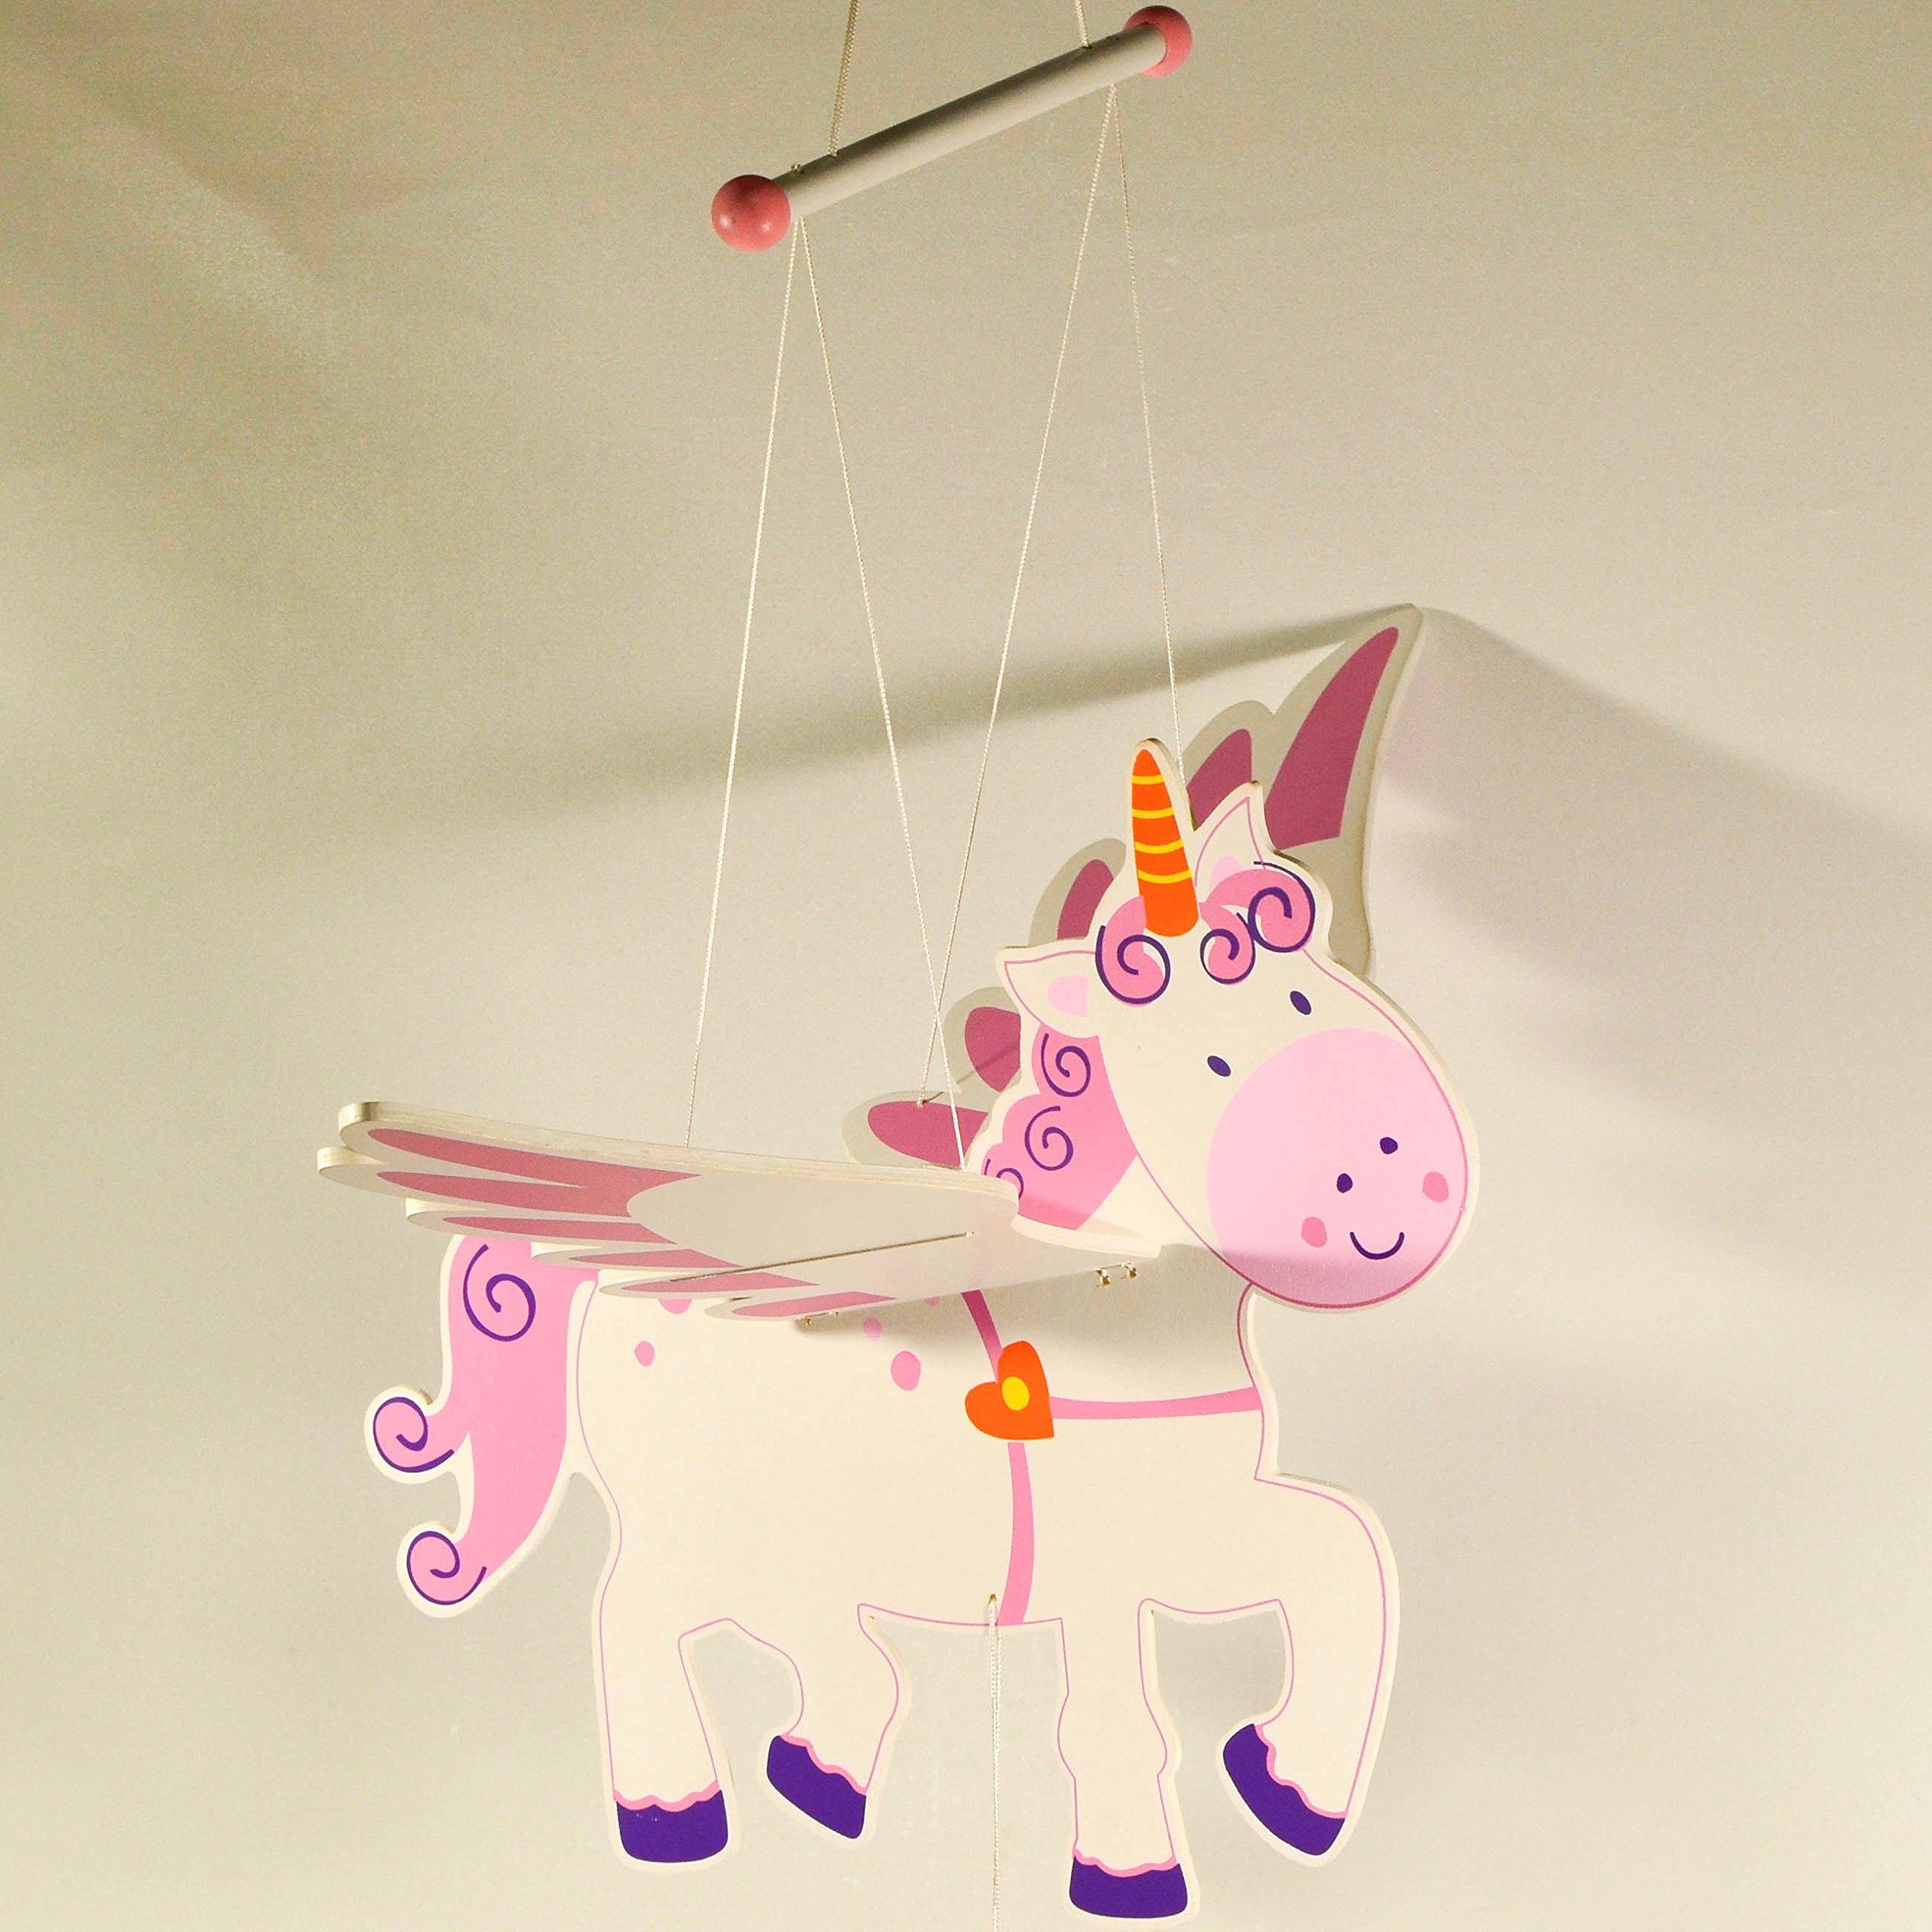 Wooden Hanging Mobile Unicorn - Nursery Decor - Baby Mobile Ornament - Baby Room Decor - Novelty Unicorn Decoration